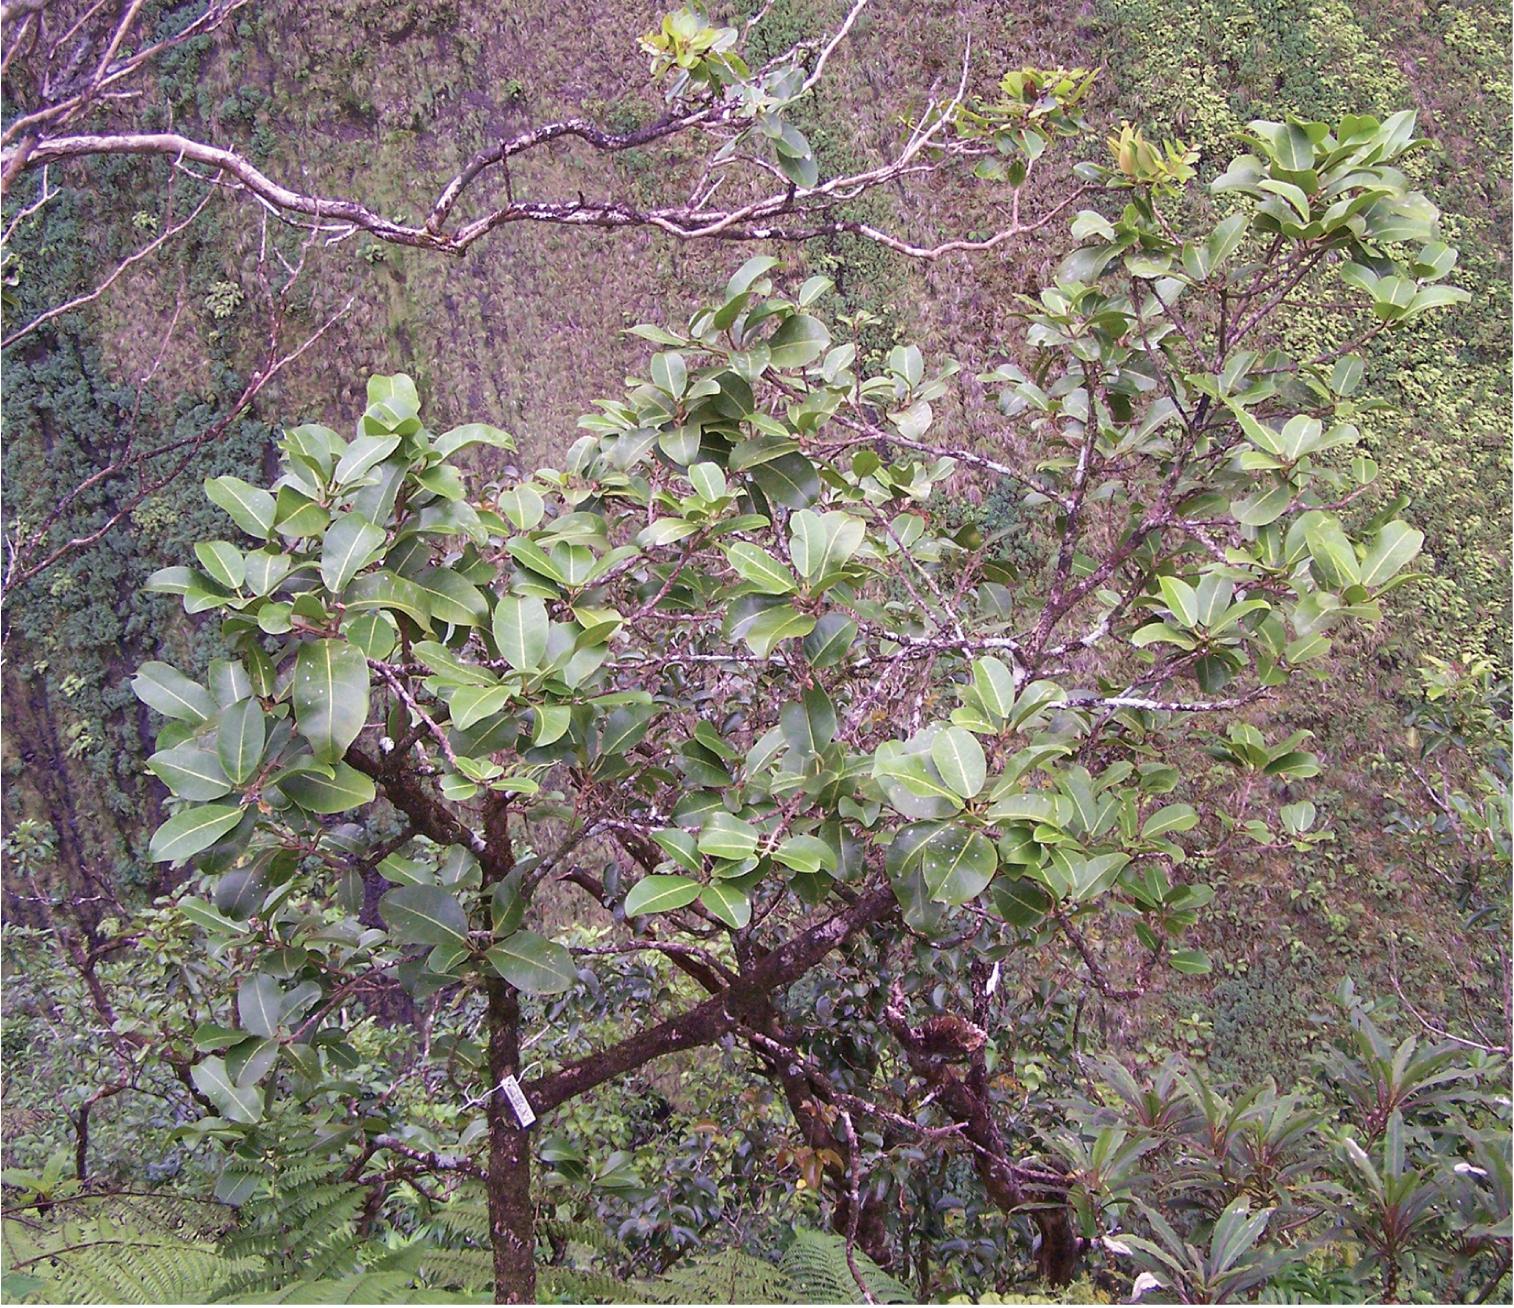 Newly named hawaiian tree species already critically endangered m oppenherimeri izmirmasajfo Images